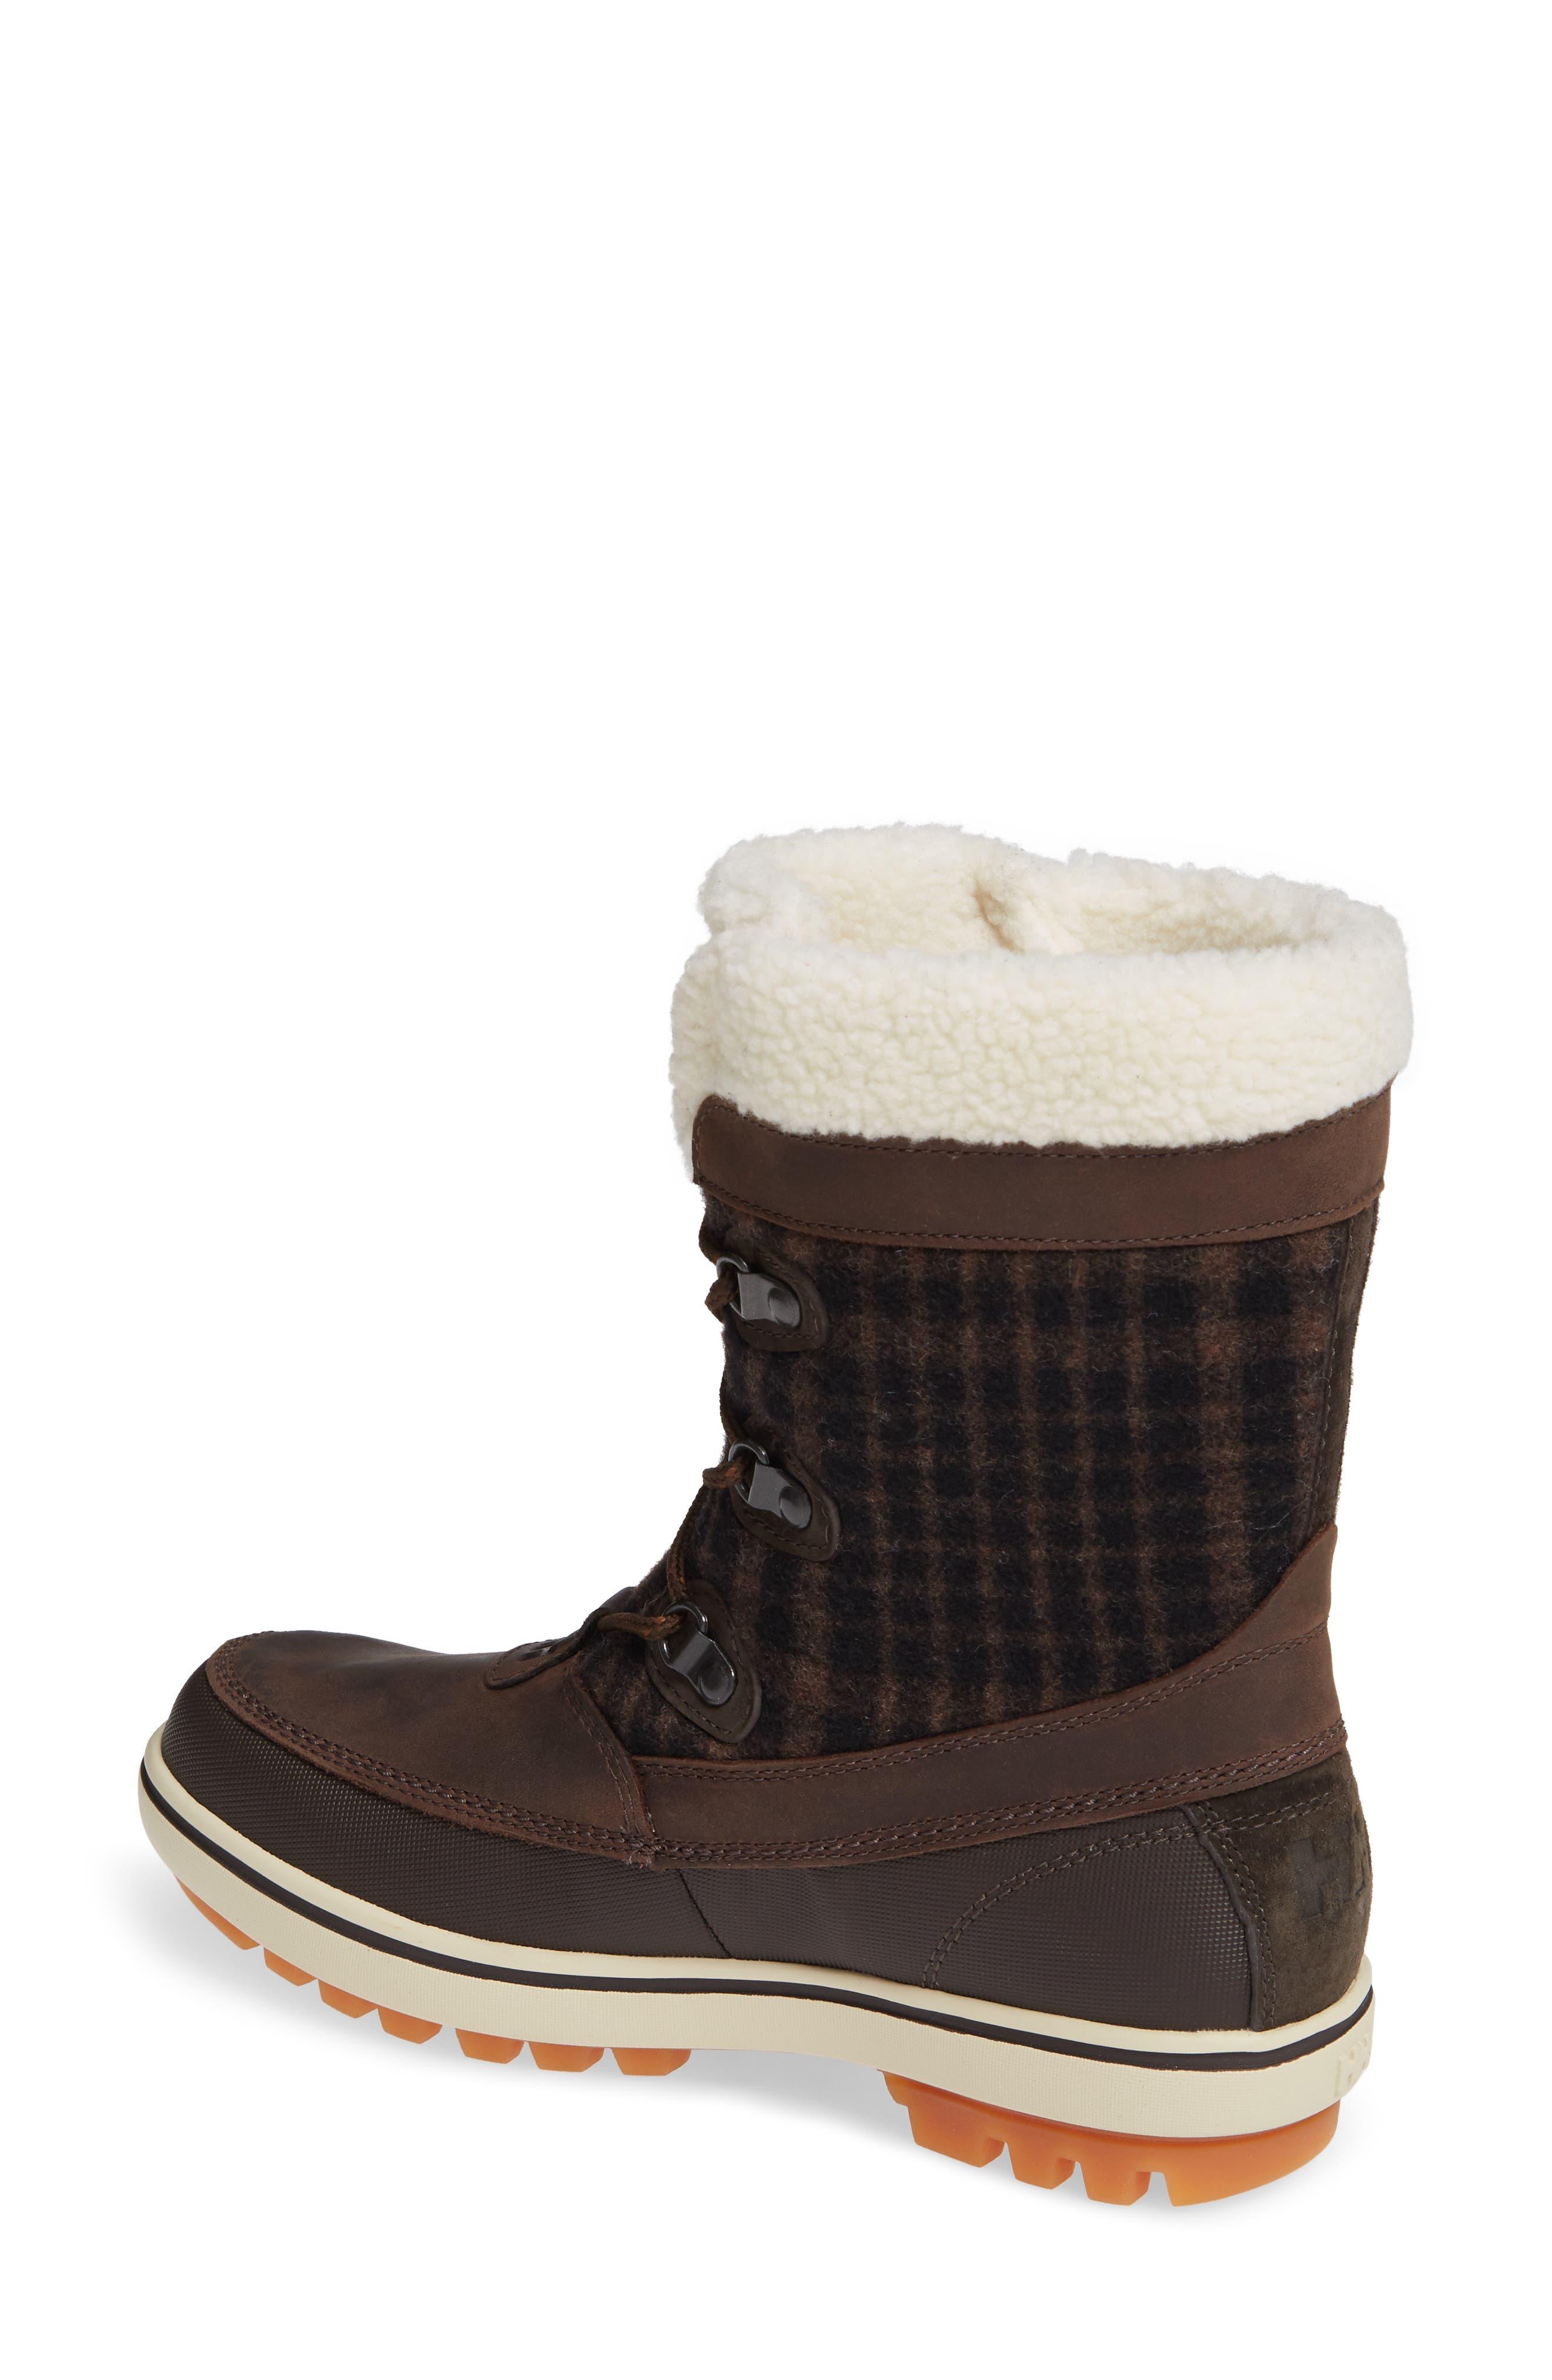 Georgina Snow Waterproof Boot,                             Alternate thumbnail 2, color,                             CLAY/ COFFEE BEAN